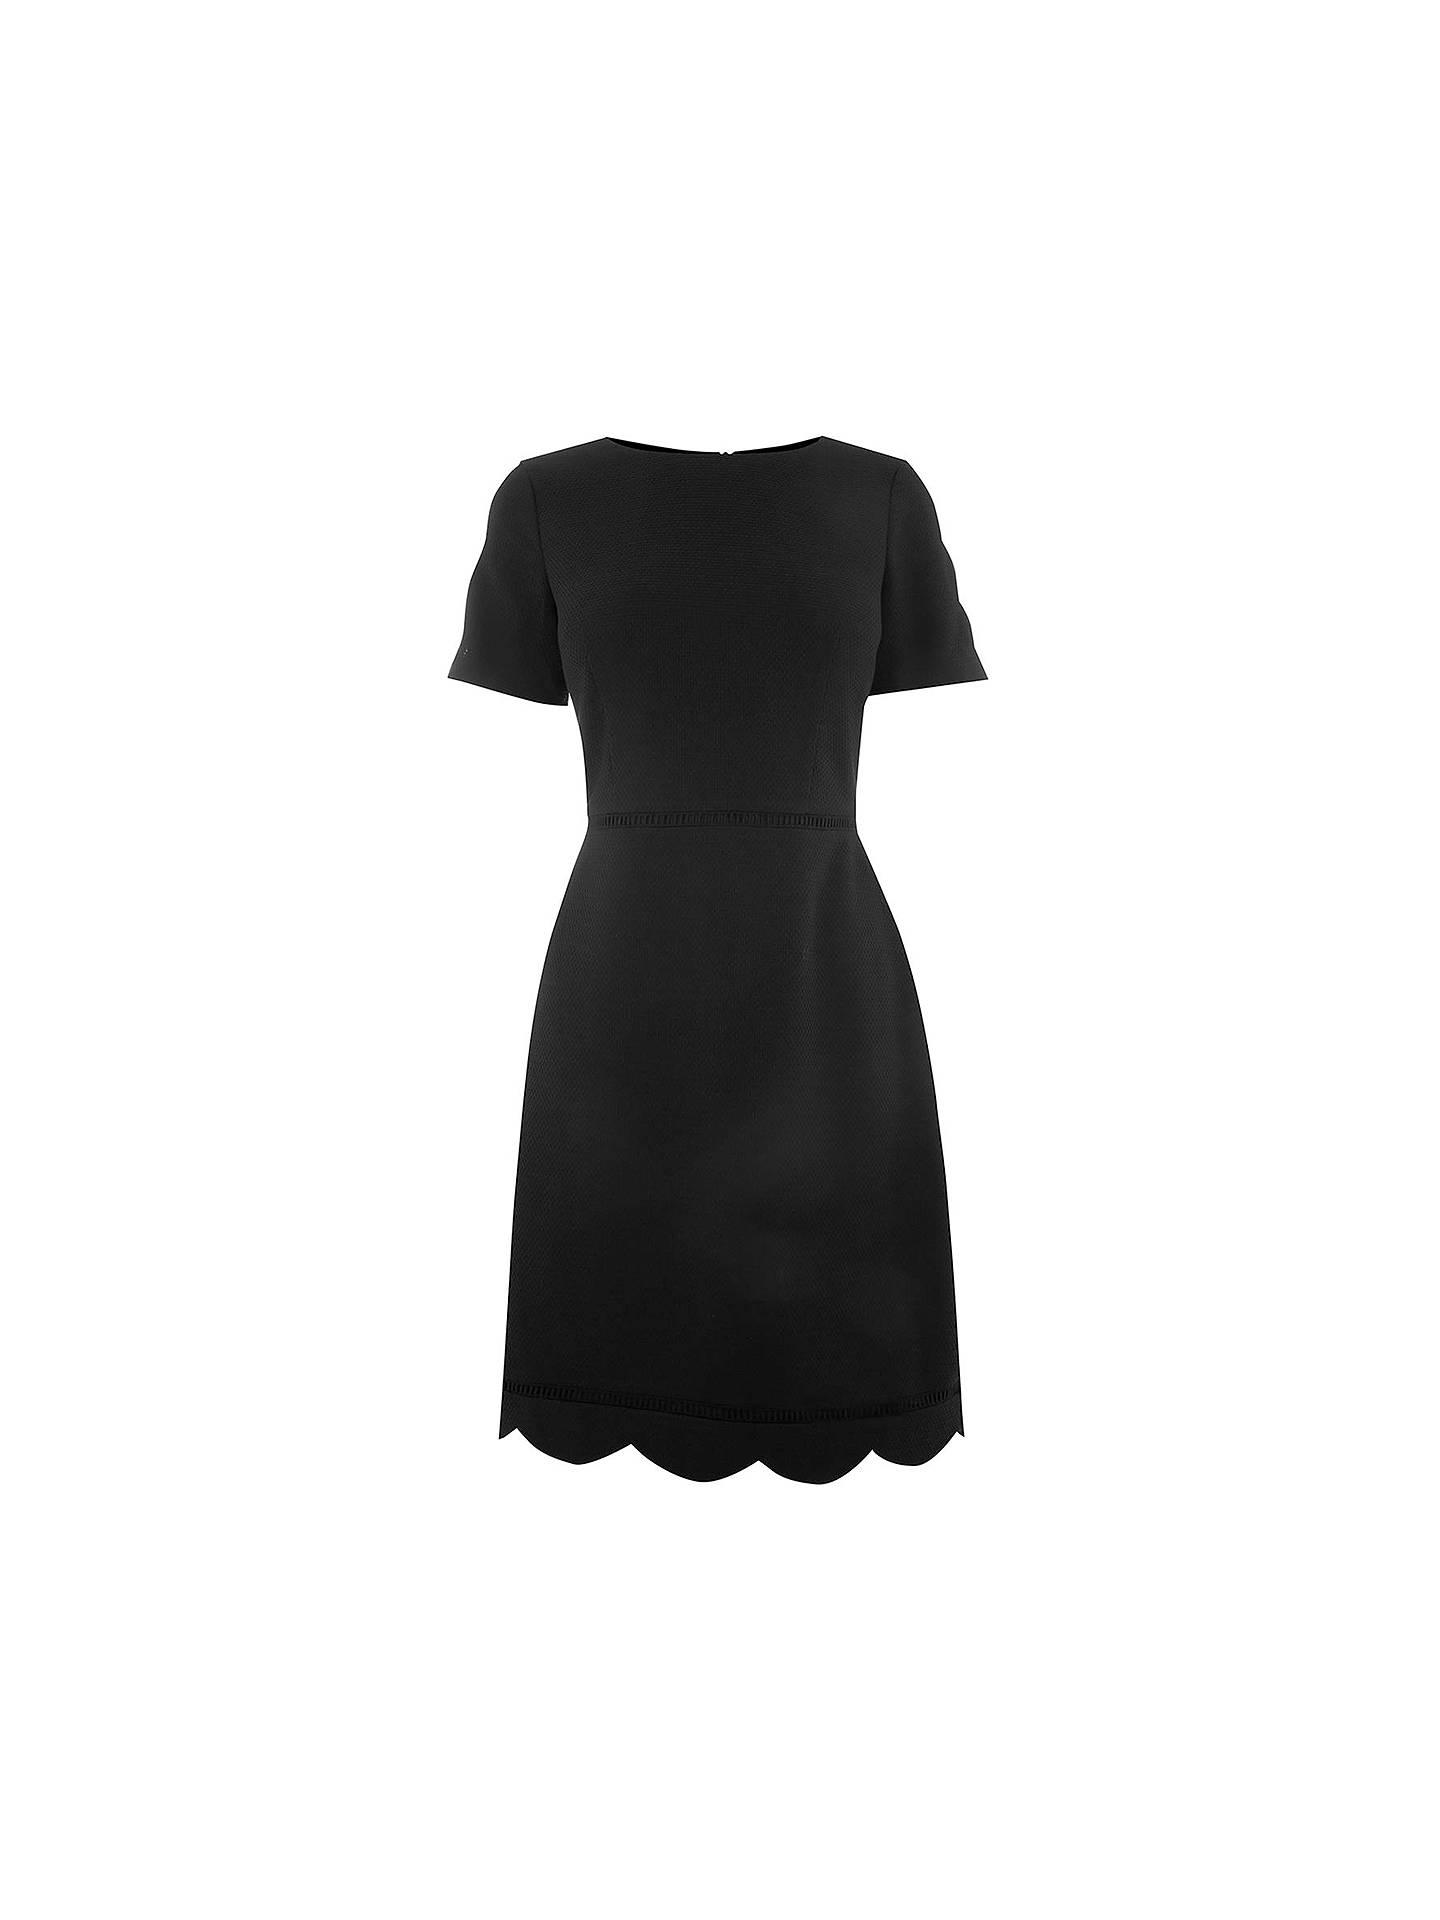 cac52d1e3c60 ... Buy Oasis Regular Length Scallop Sleeve Dress, Black, 6 Online at  johnlewis.com ...